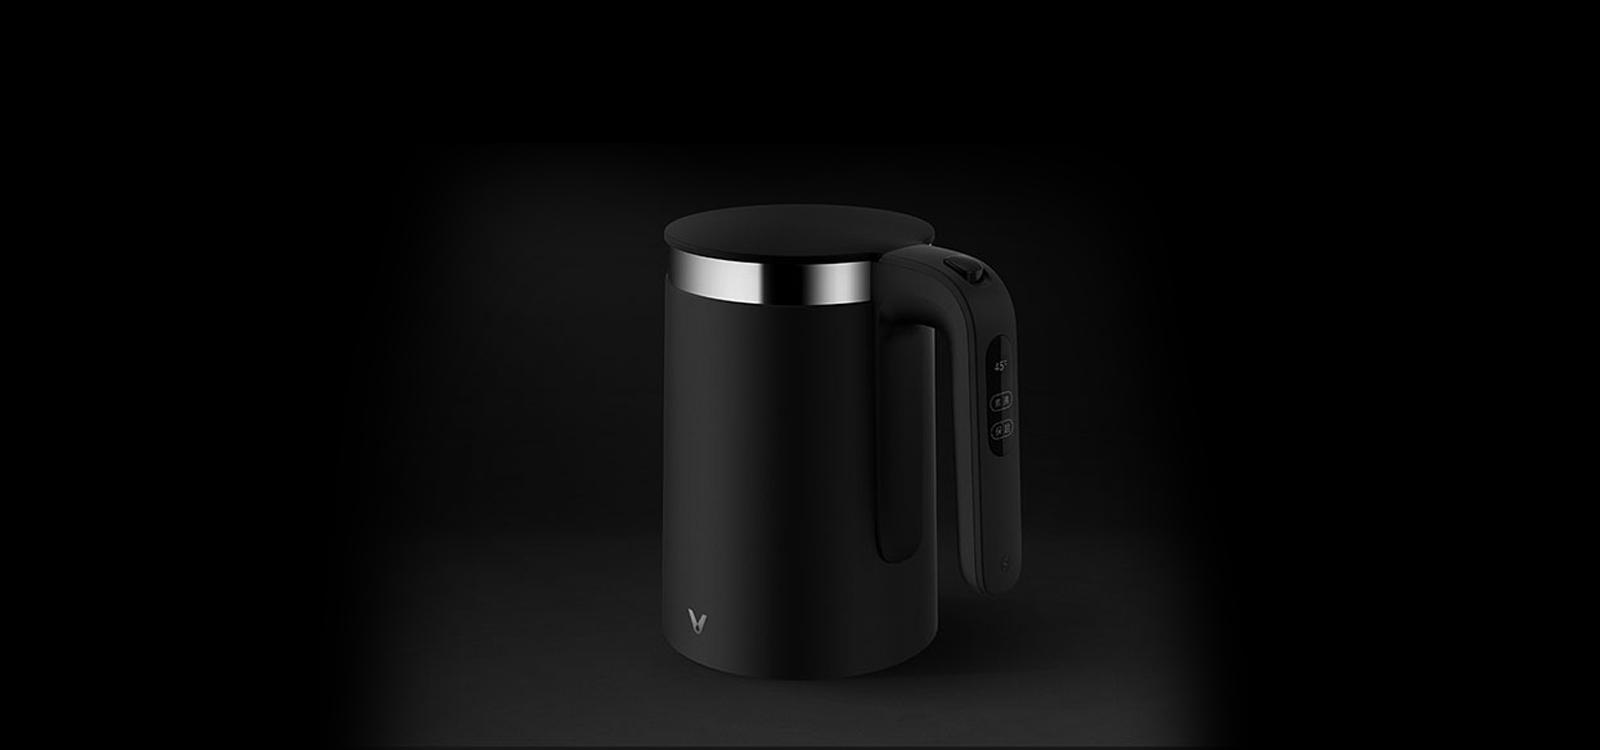 Xiaomi Viomi Smart Kettle Pro